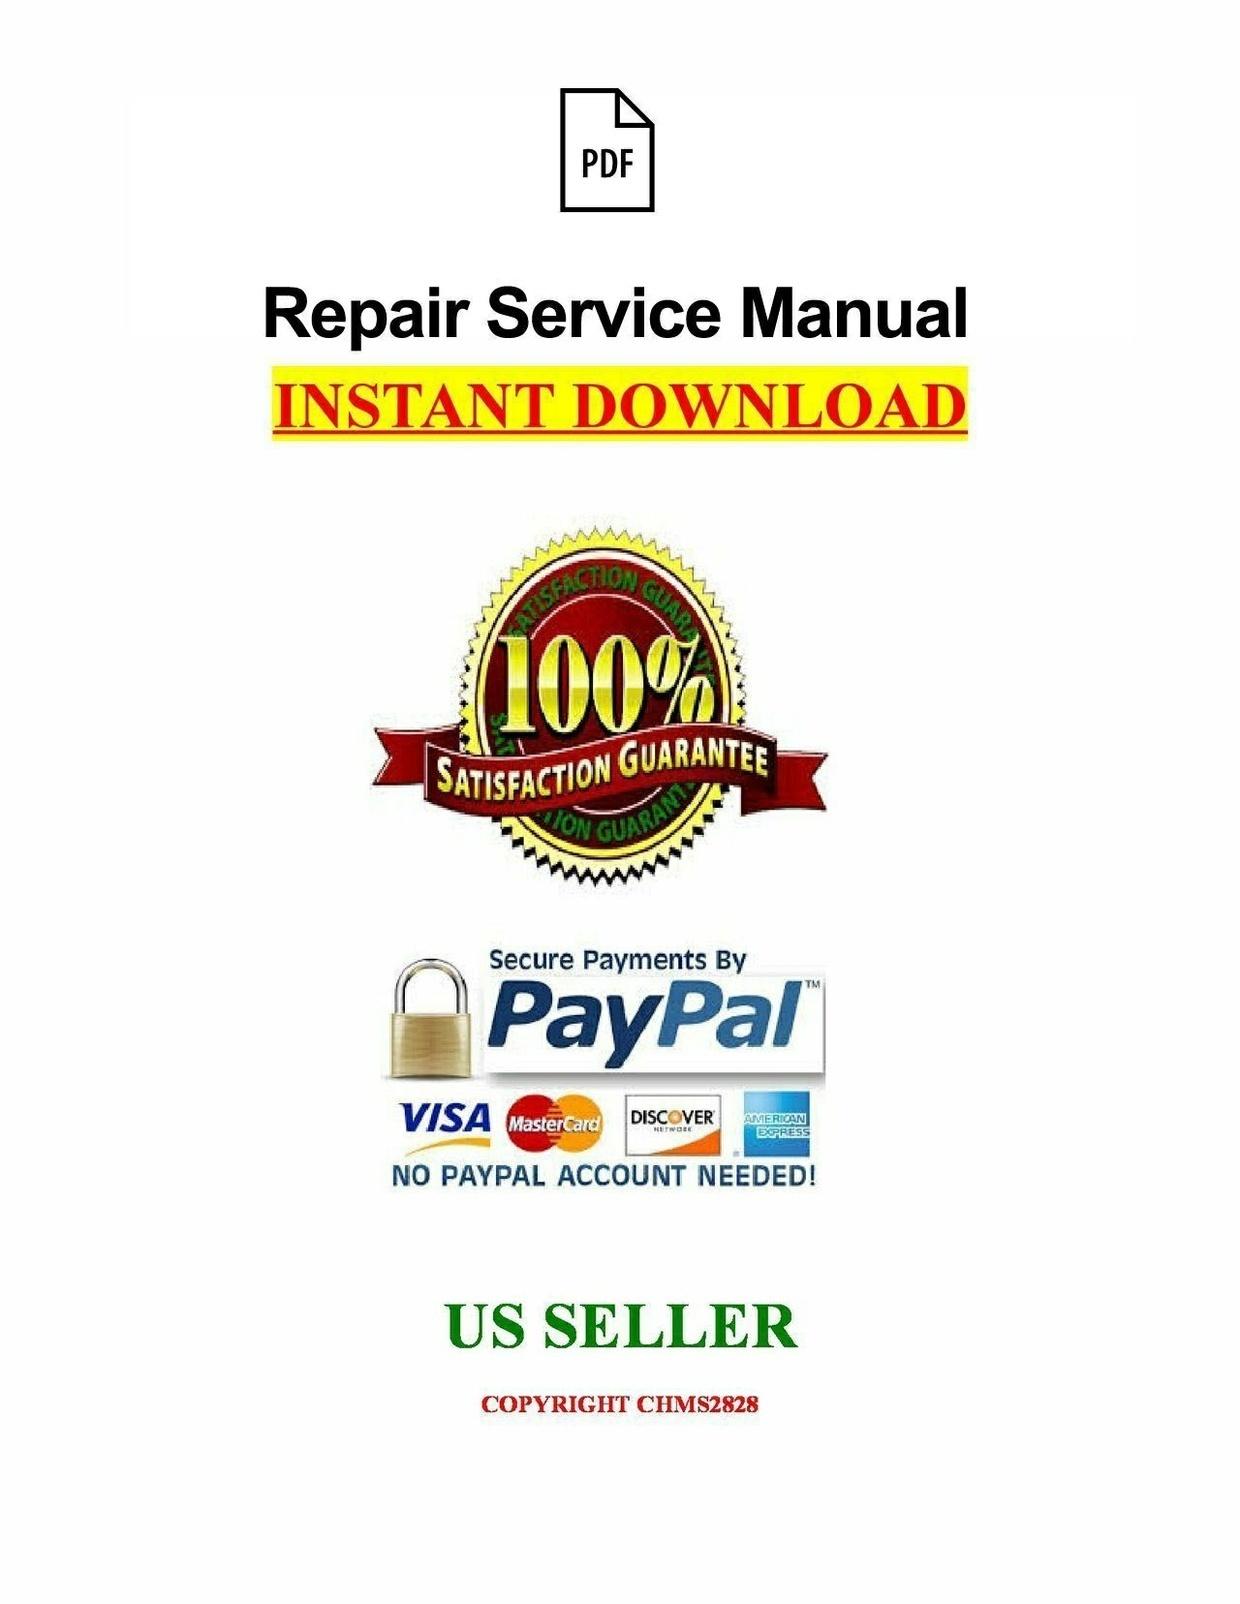 JCB Midi CX Backhoe Loader Service Repair Manual PDF